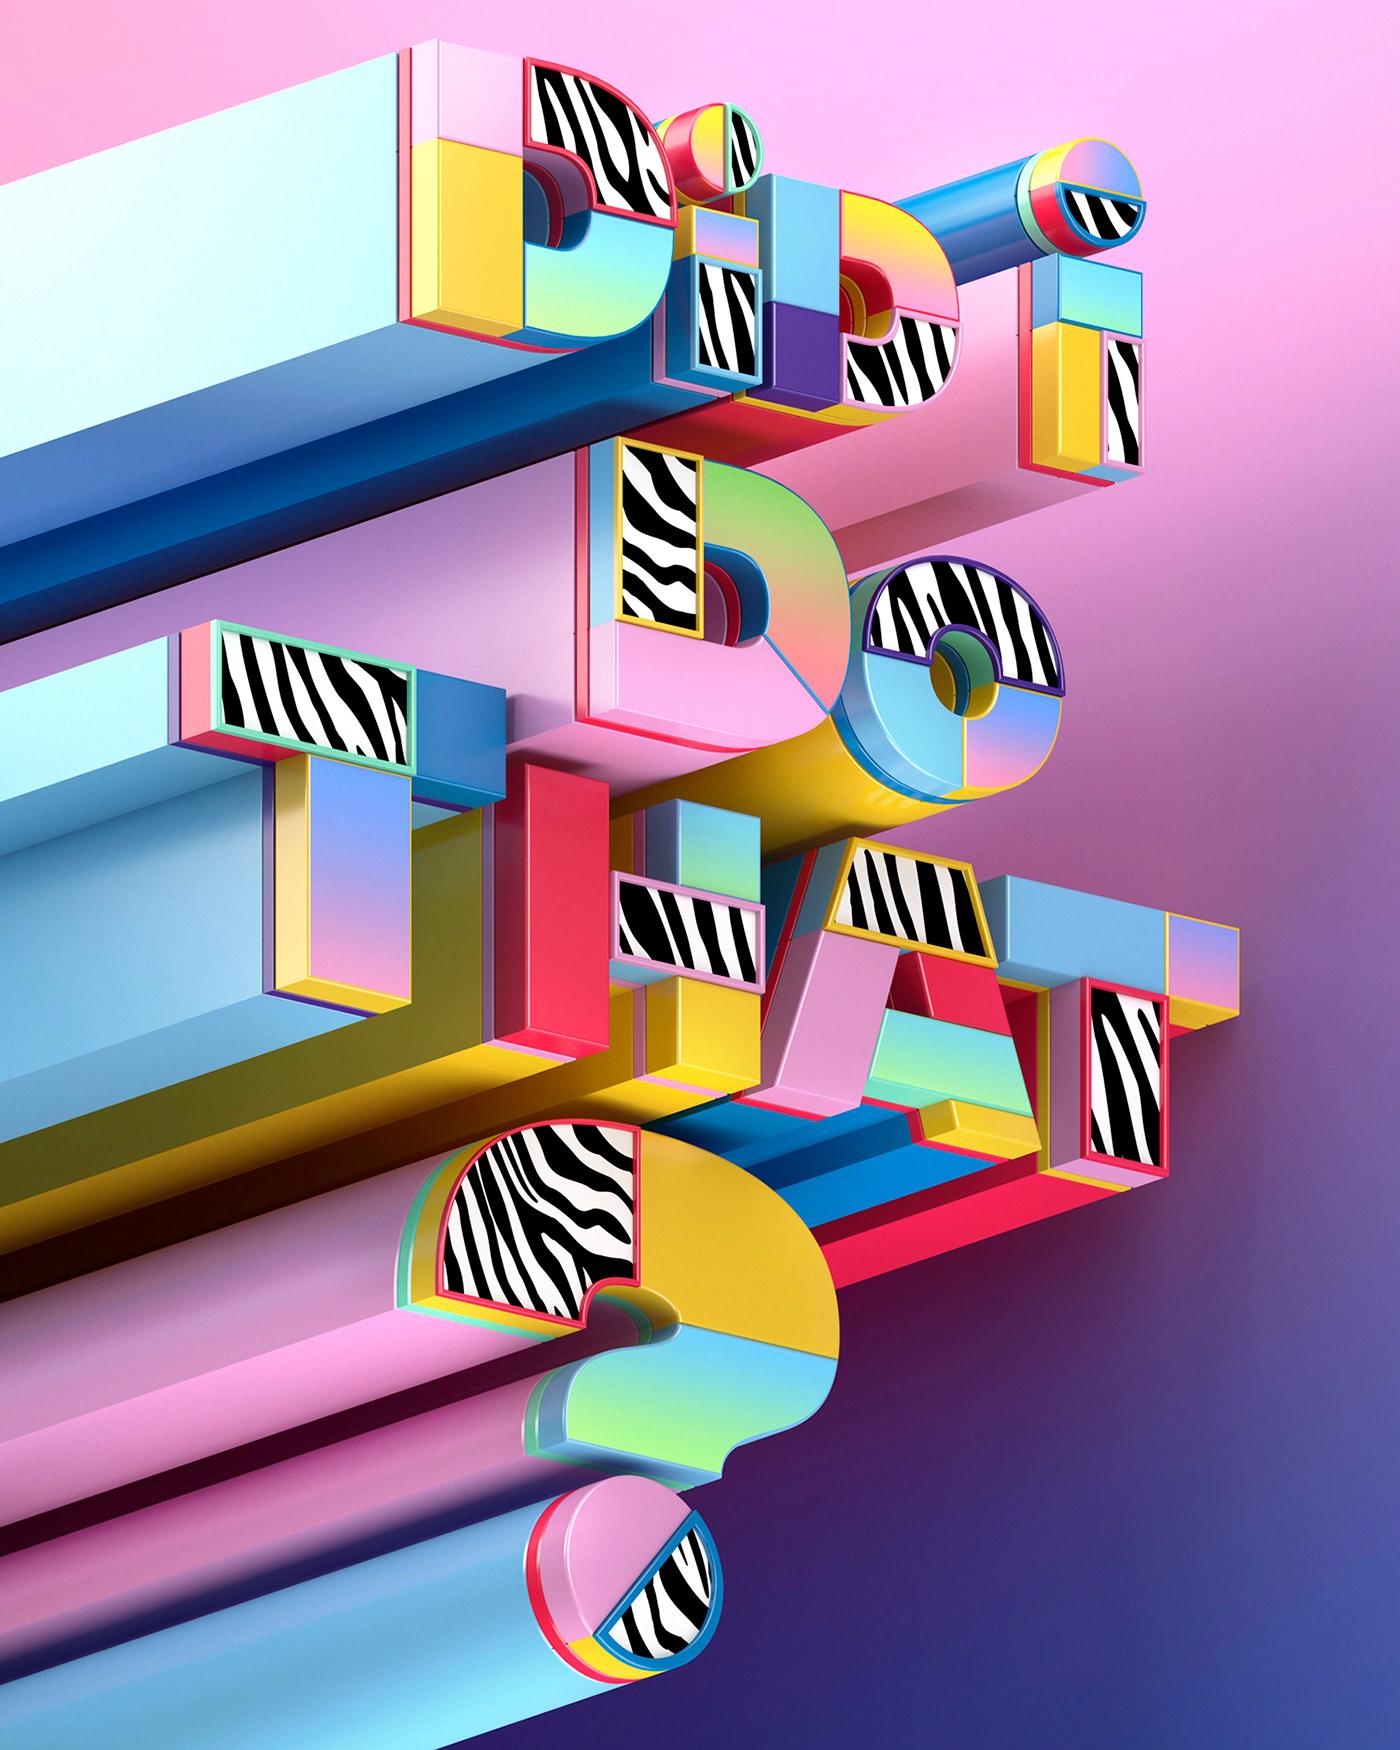 Thiết kế bởi Muokkaa Studio